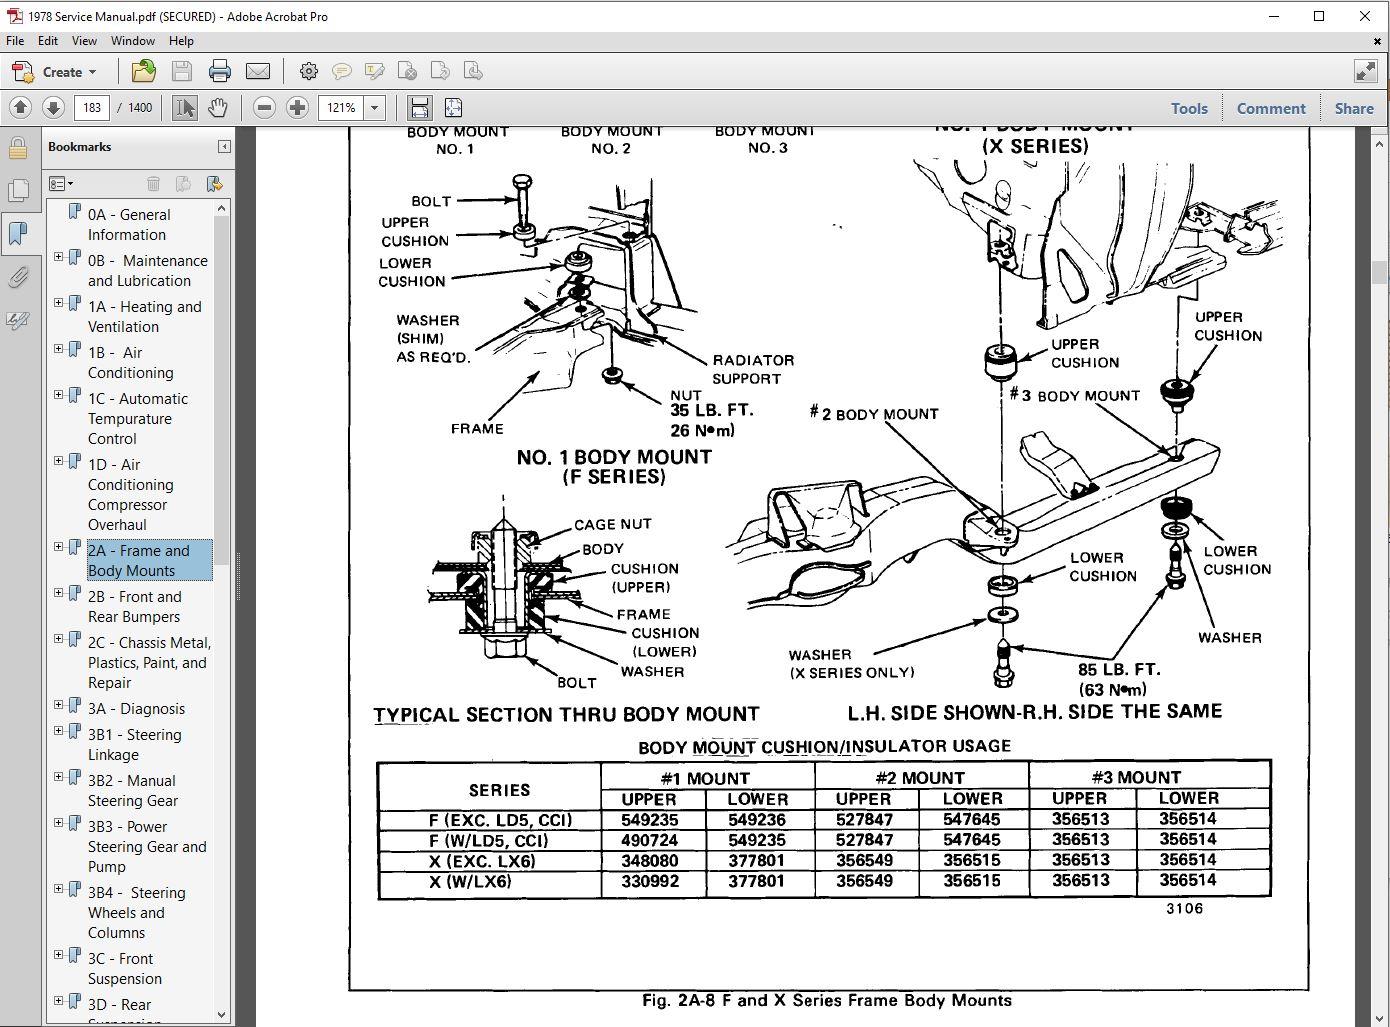 1978 pontiac complete restoration manual